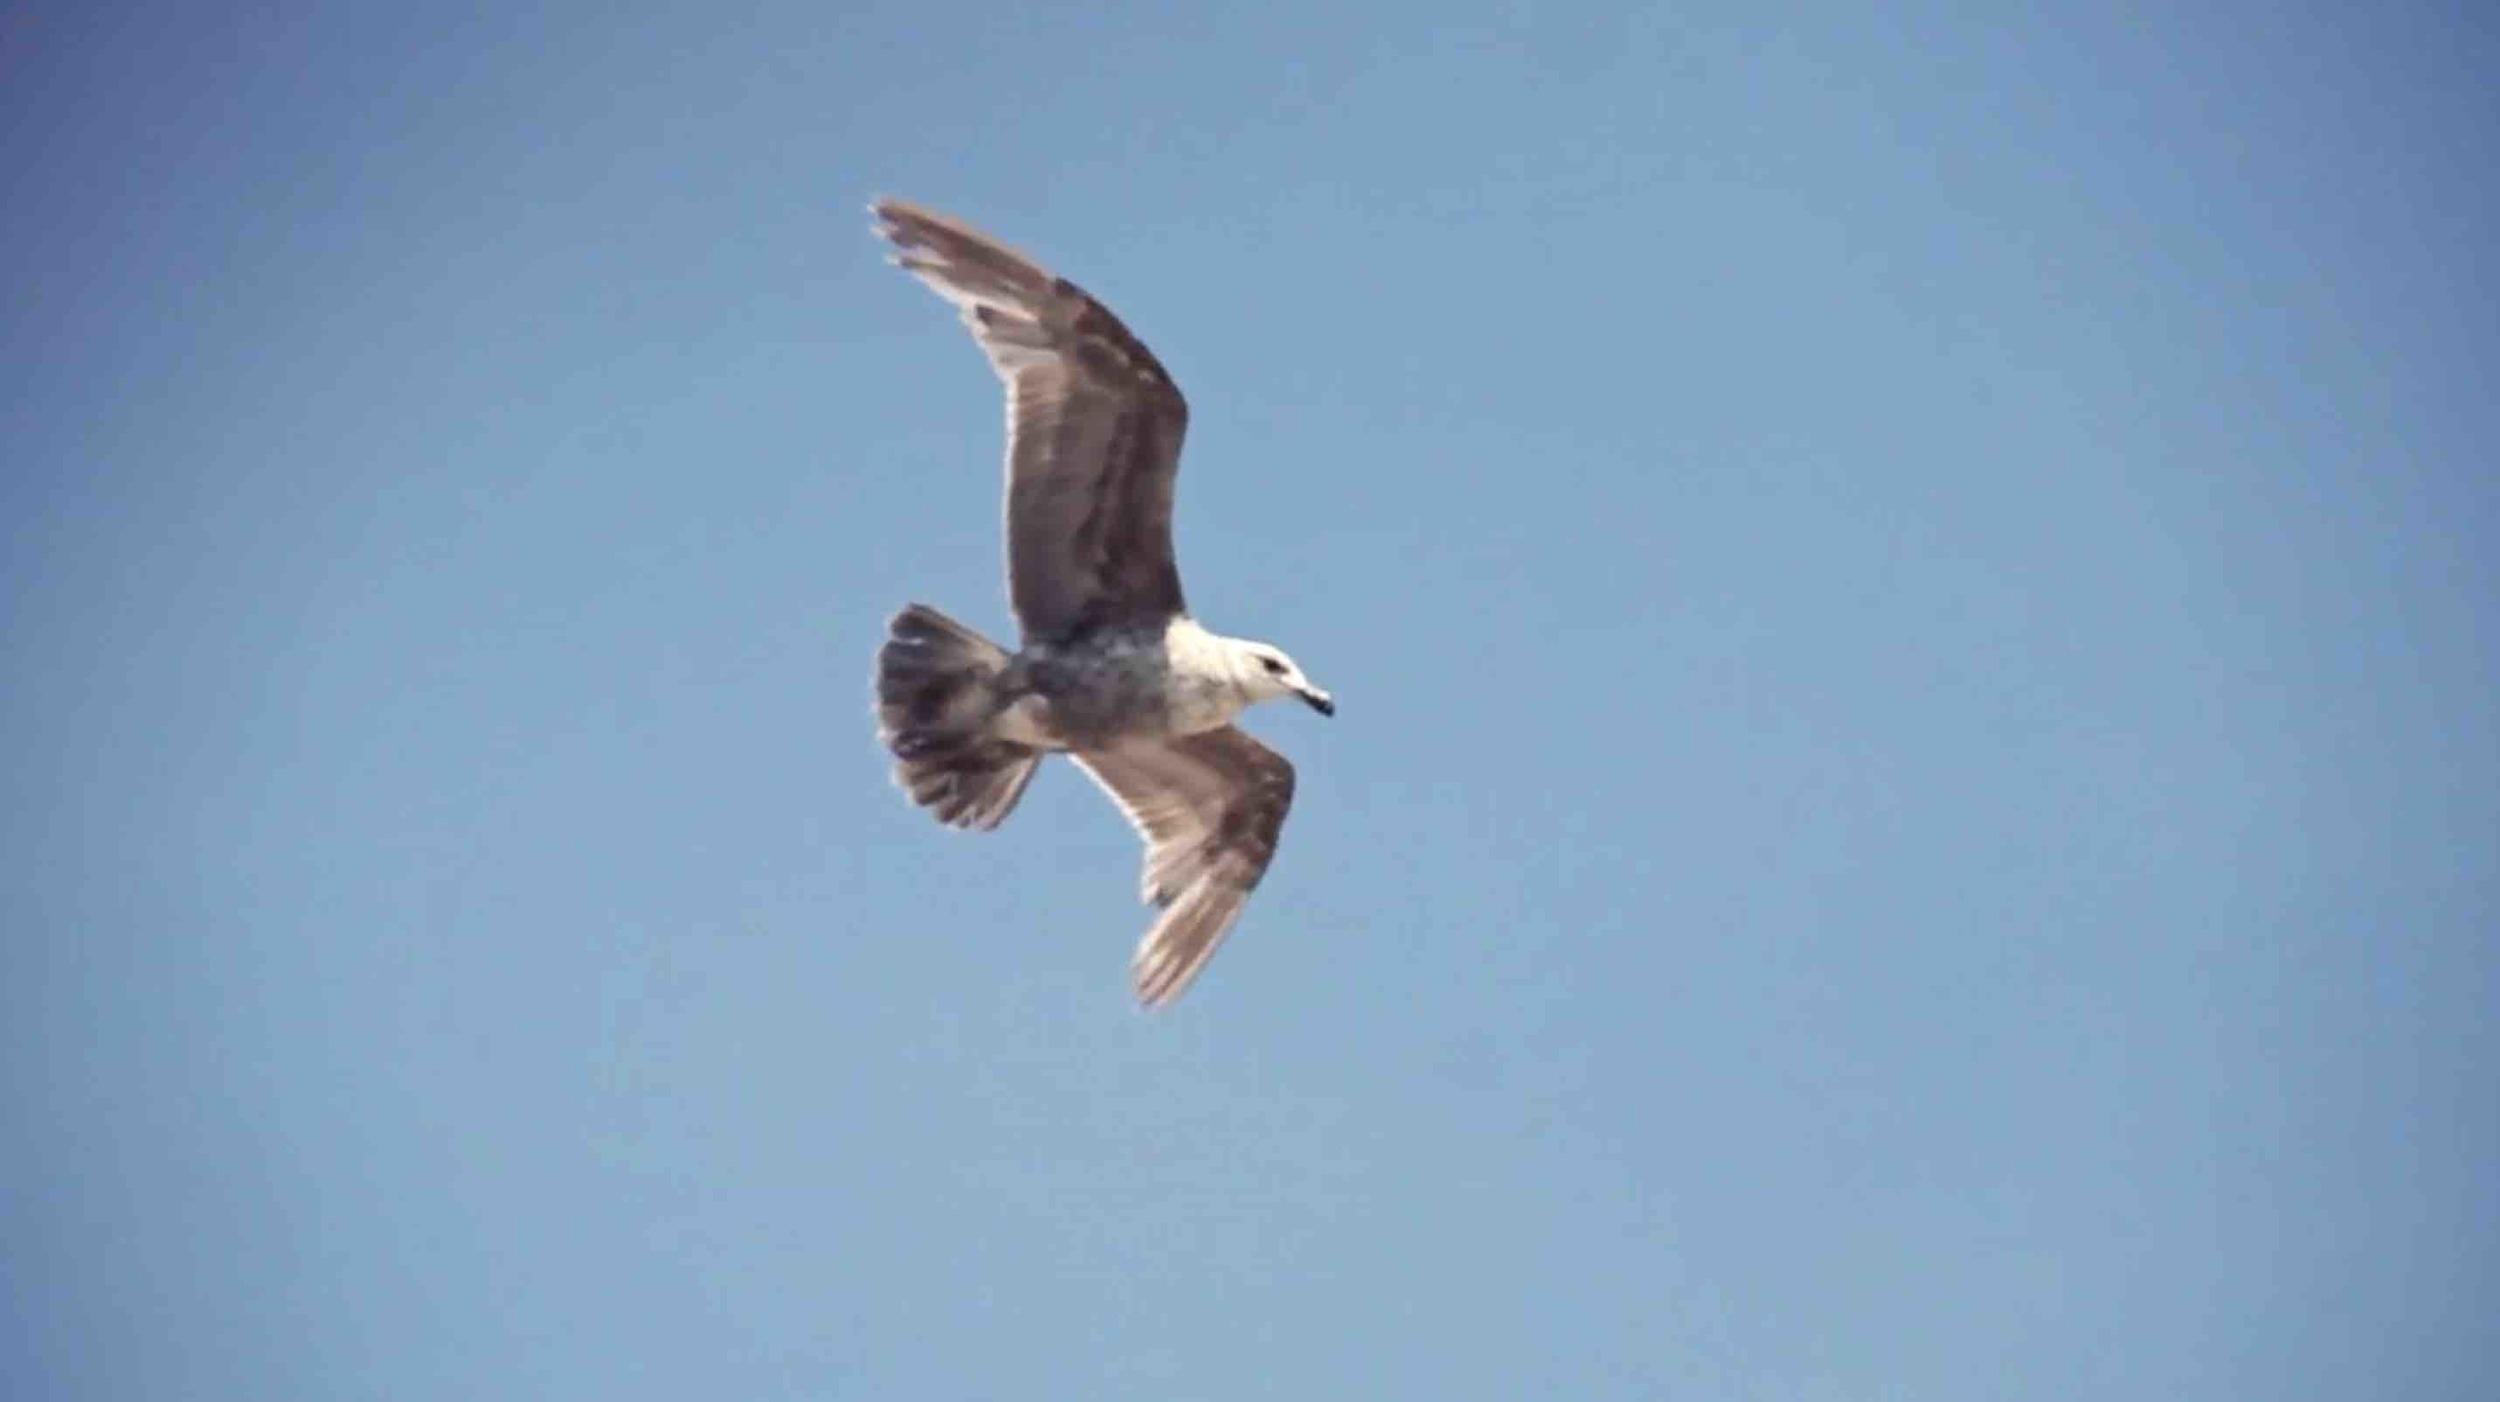 Seagulls are classic symbols of Summer